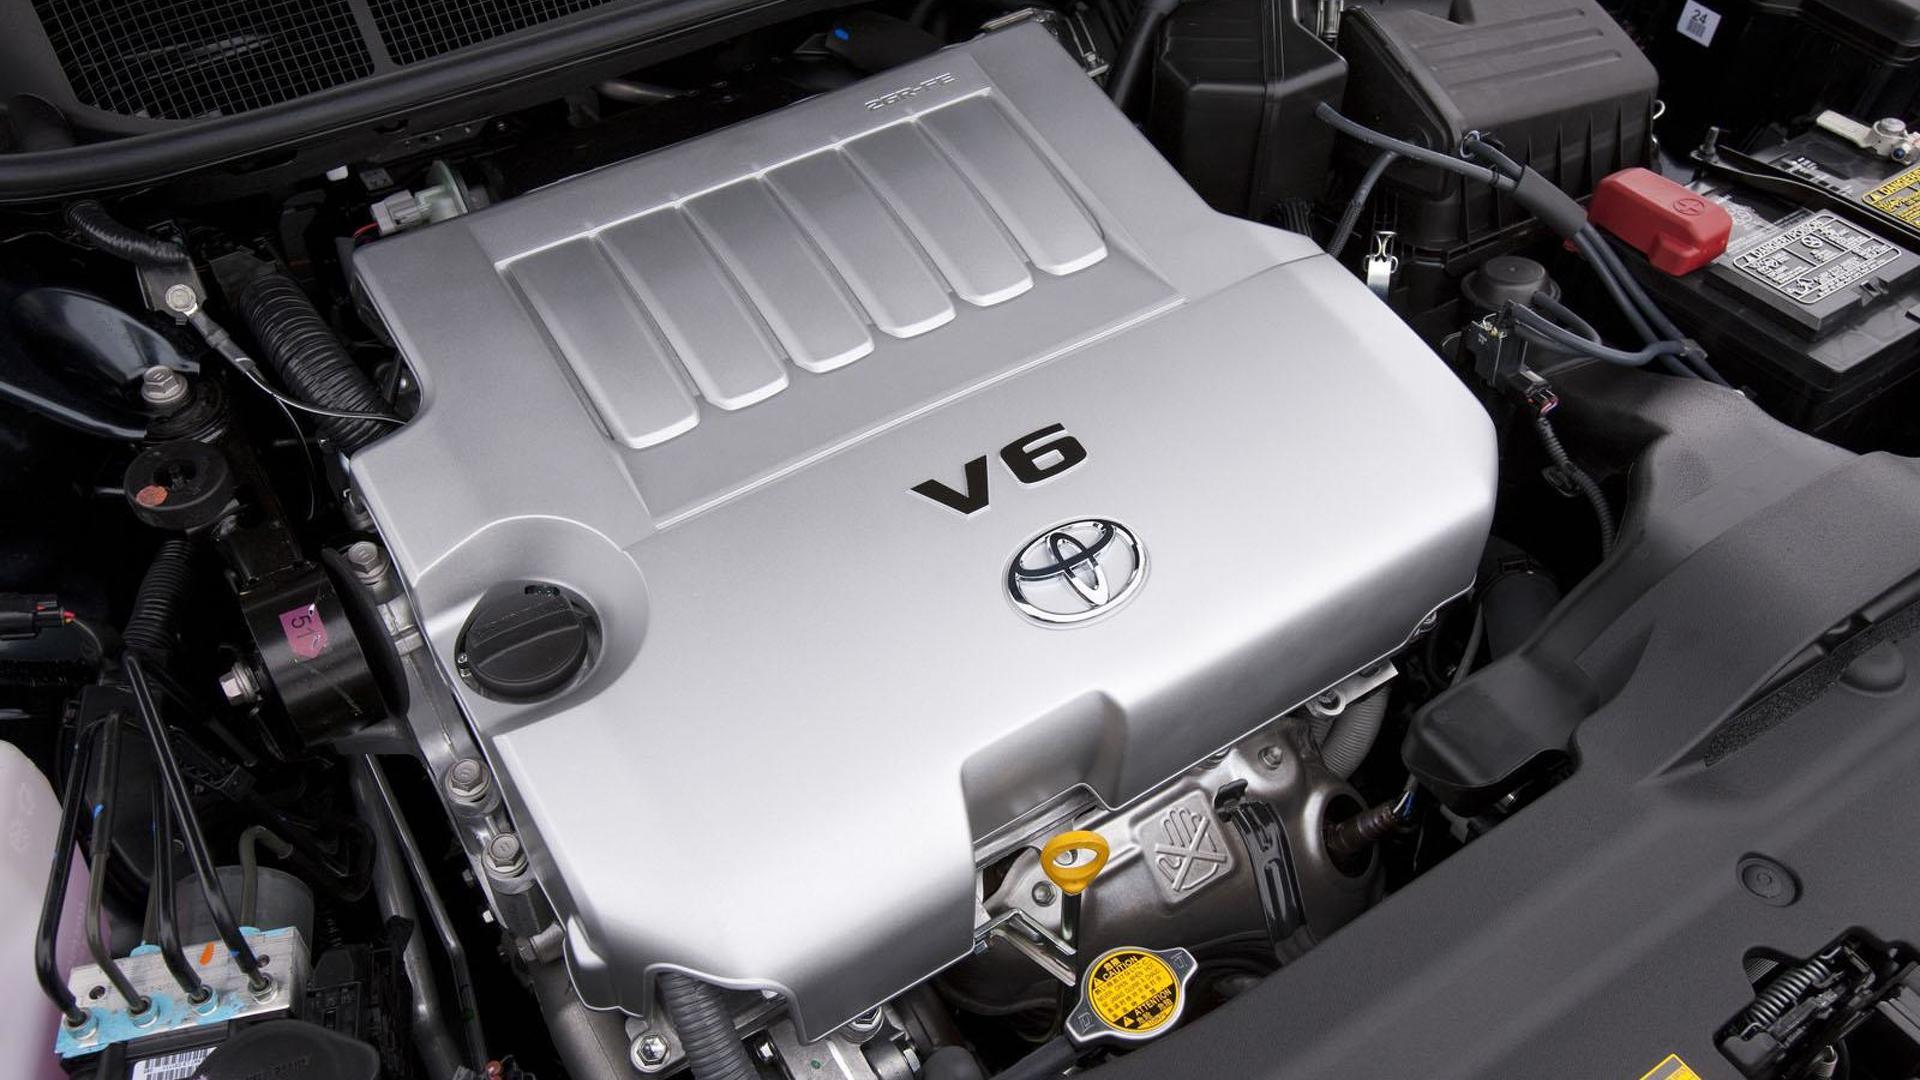 Toyota Venza 1ar fe awd p0171 #1